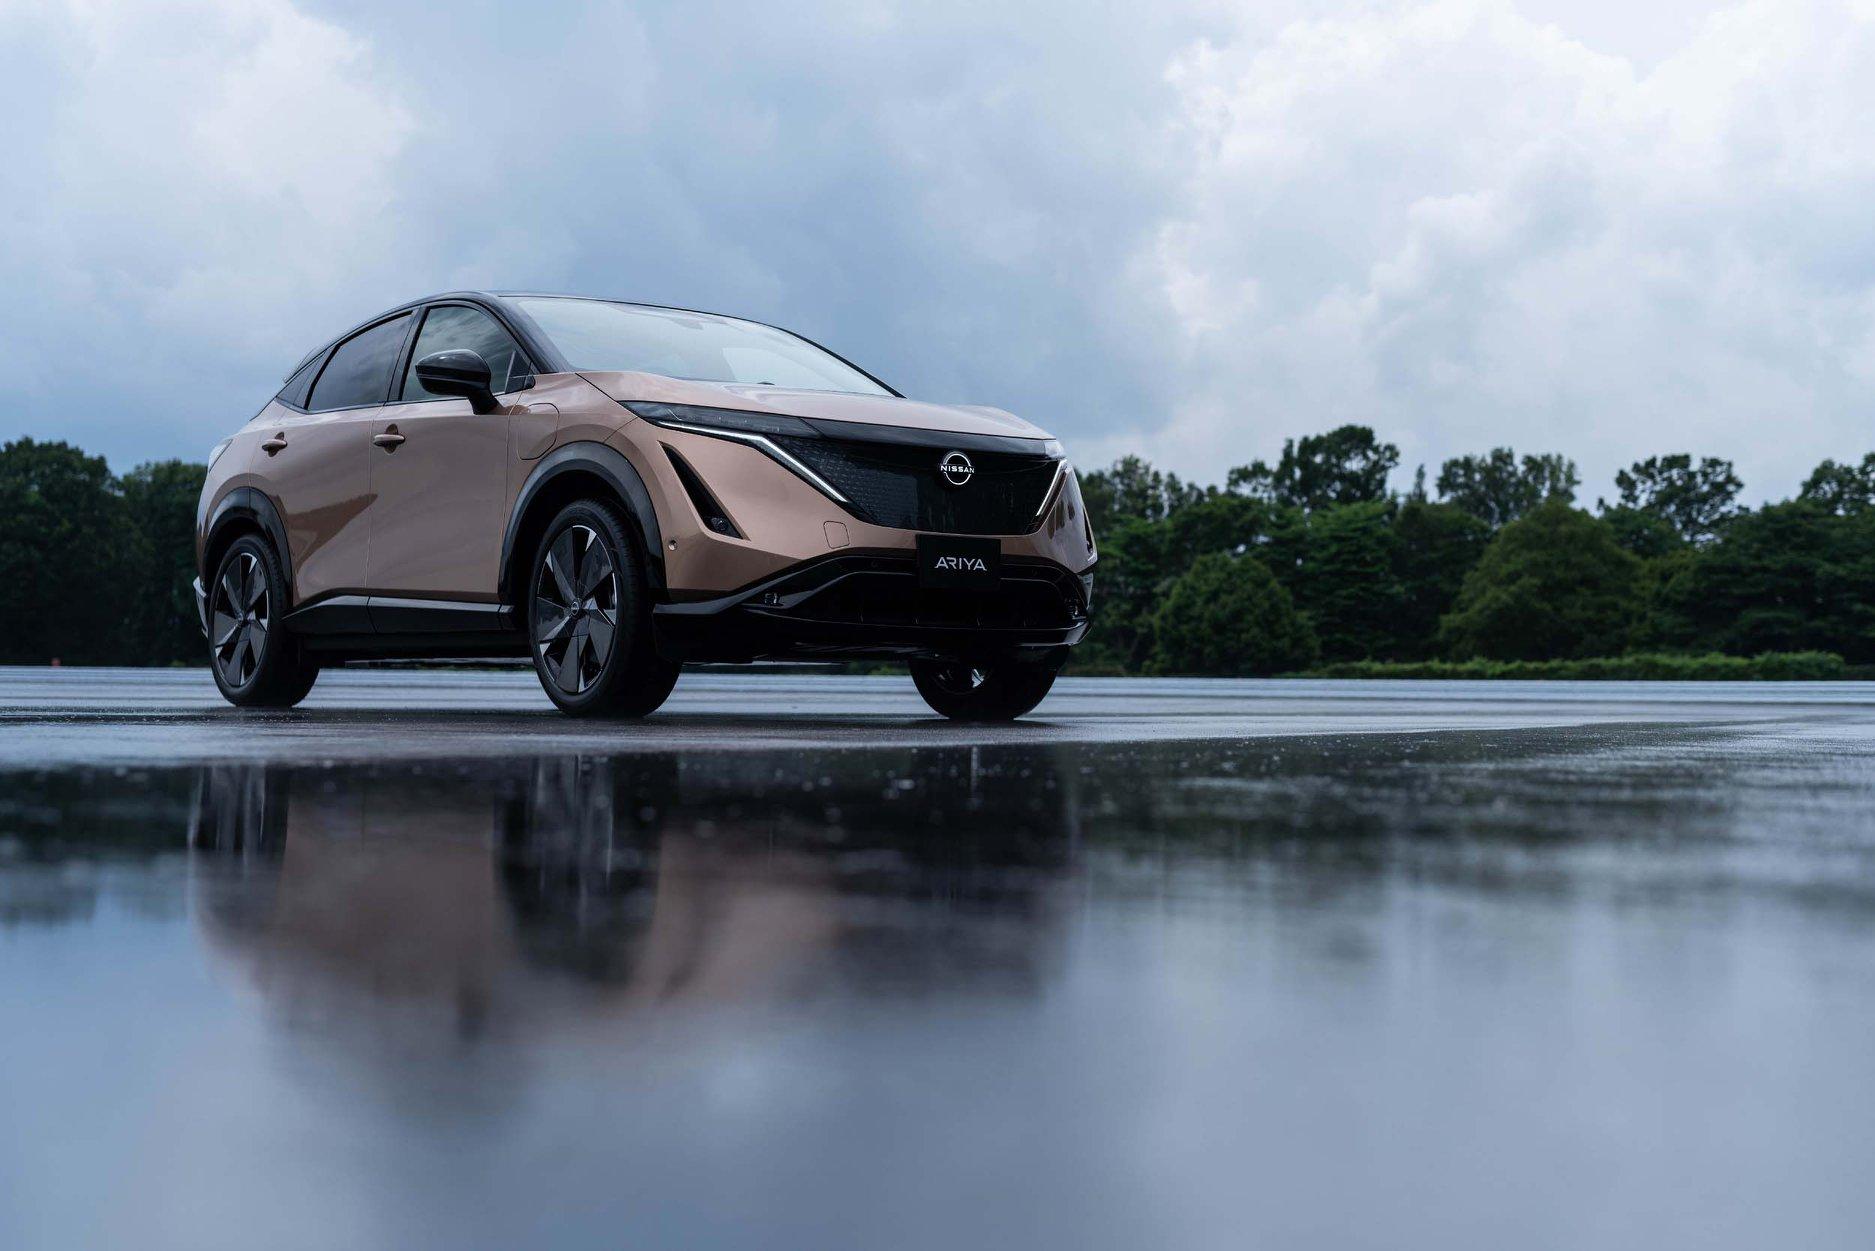 Nissan Ariya: ένα ηλεκτρικό coupé crossover για μια νέα εποχή